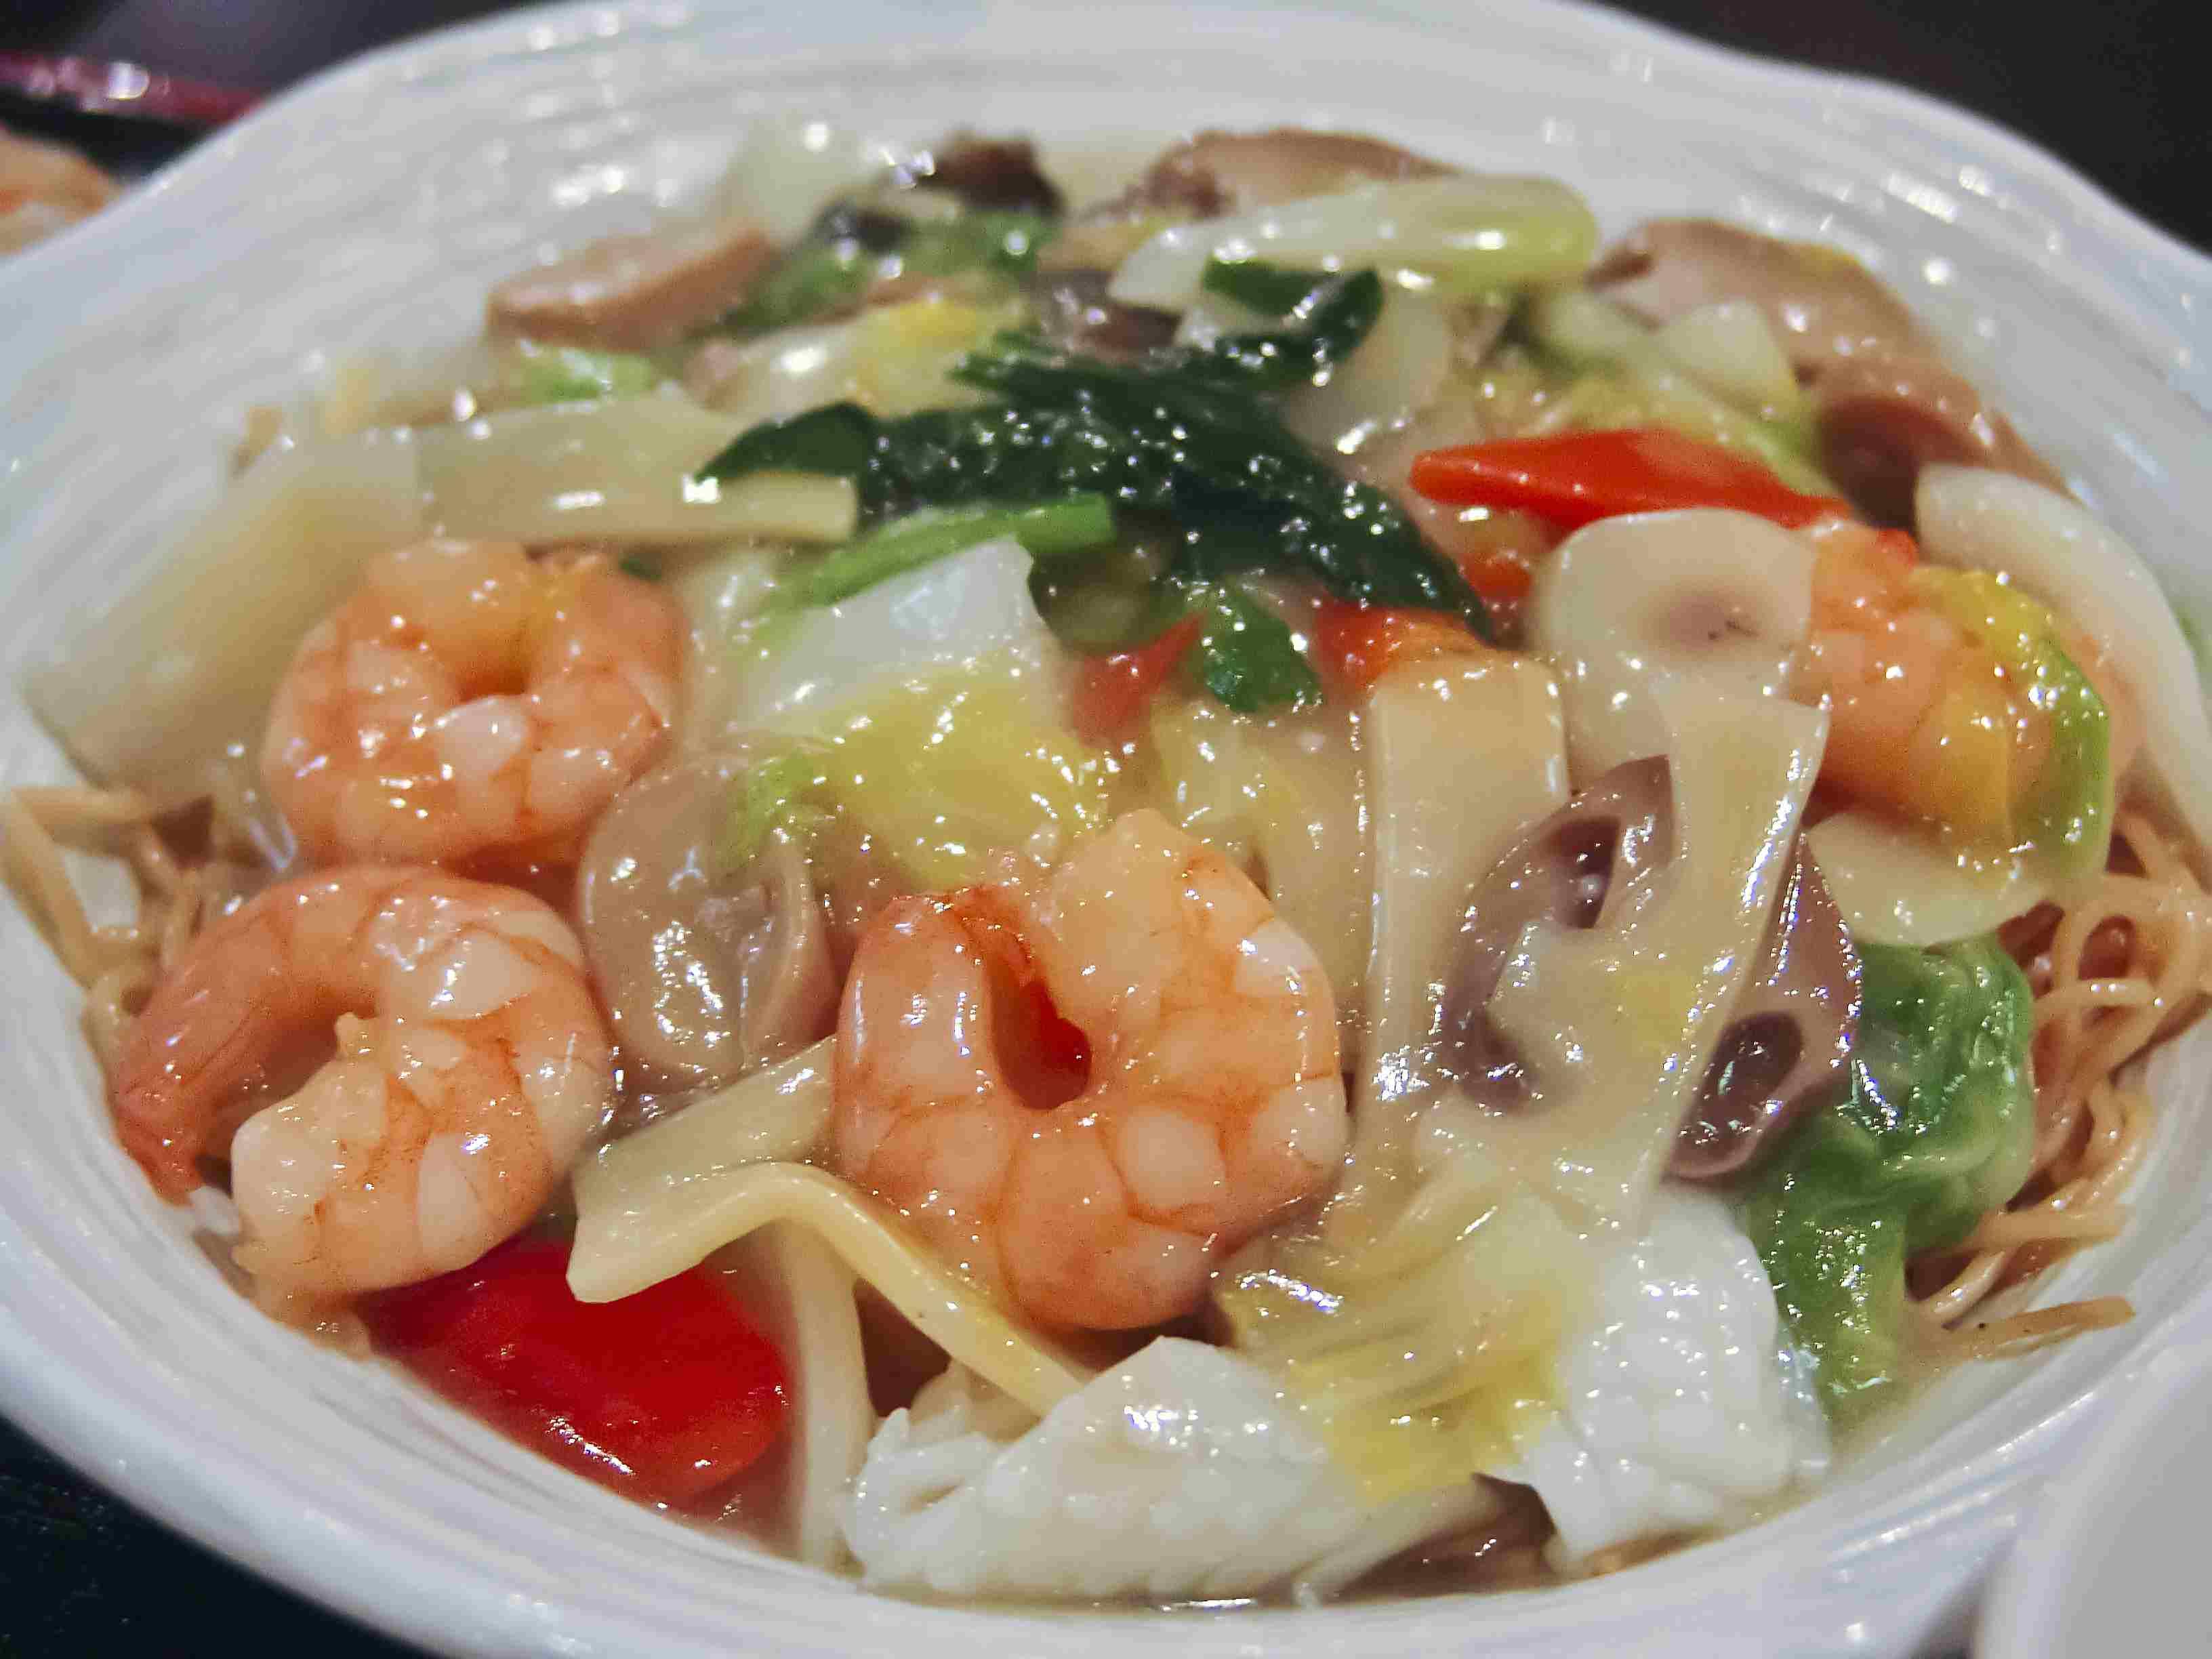 Dining Gluten Free At Ethnic Restaurants